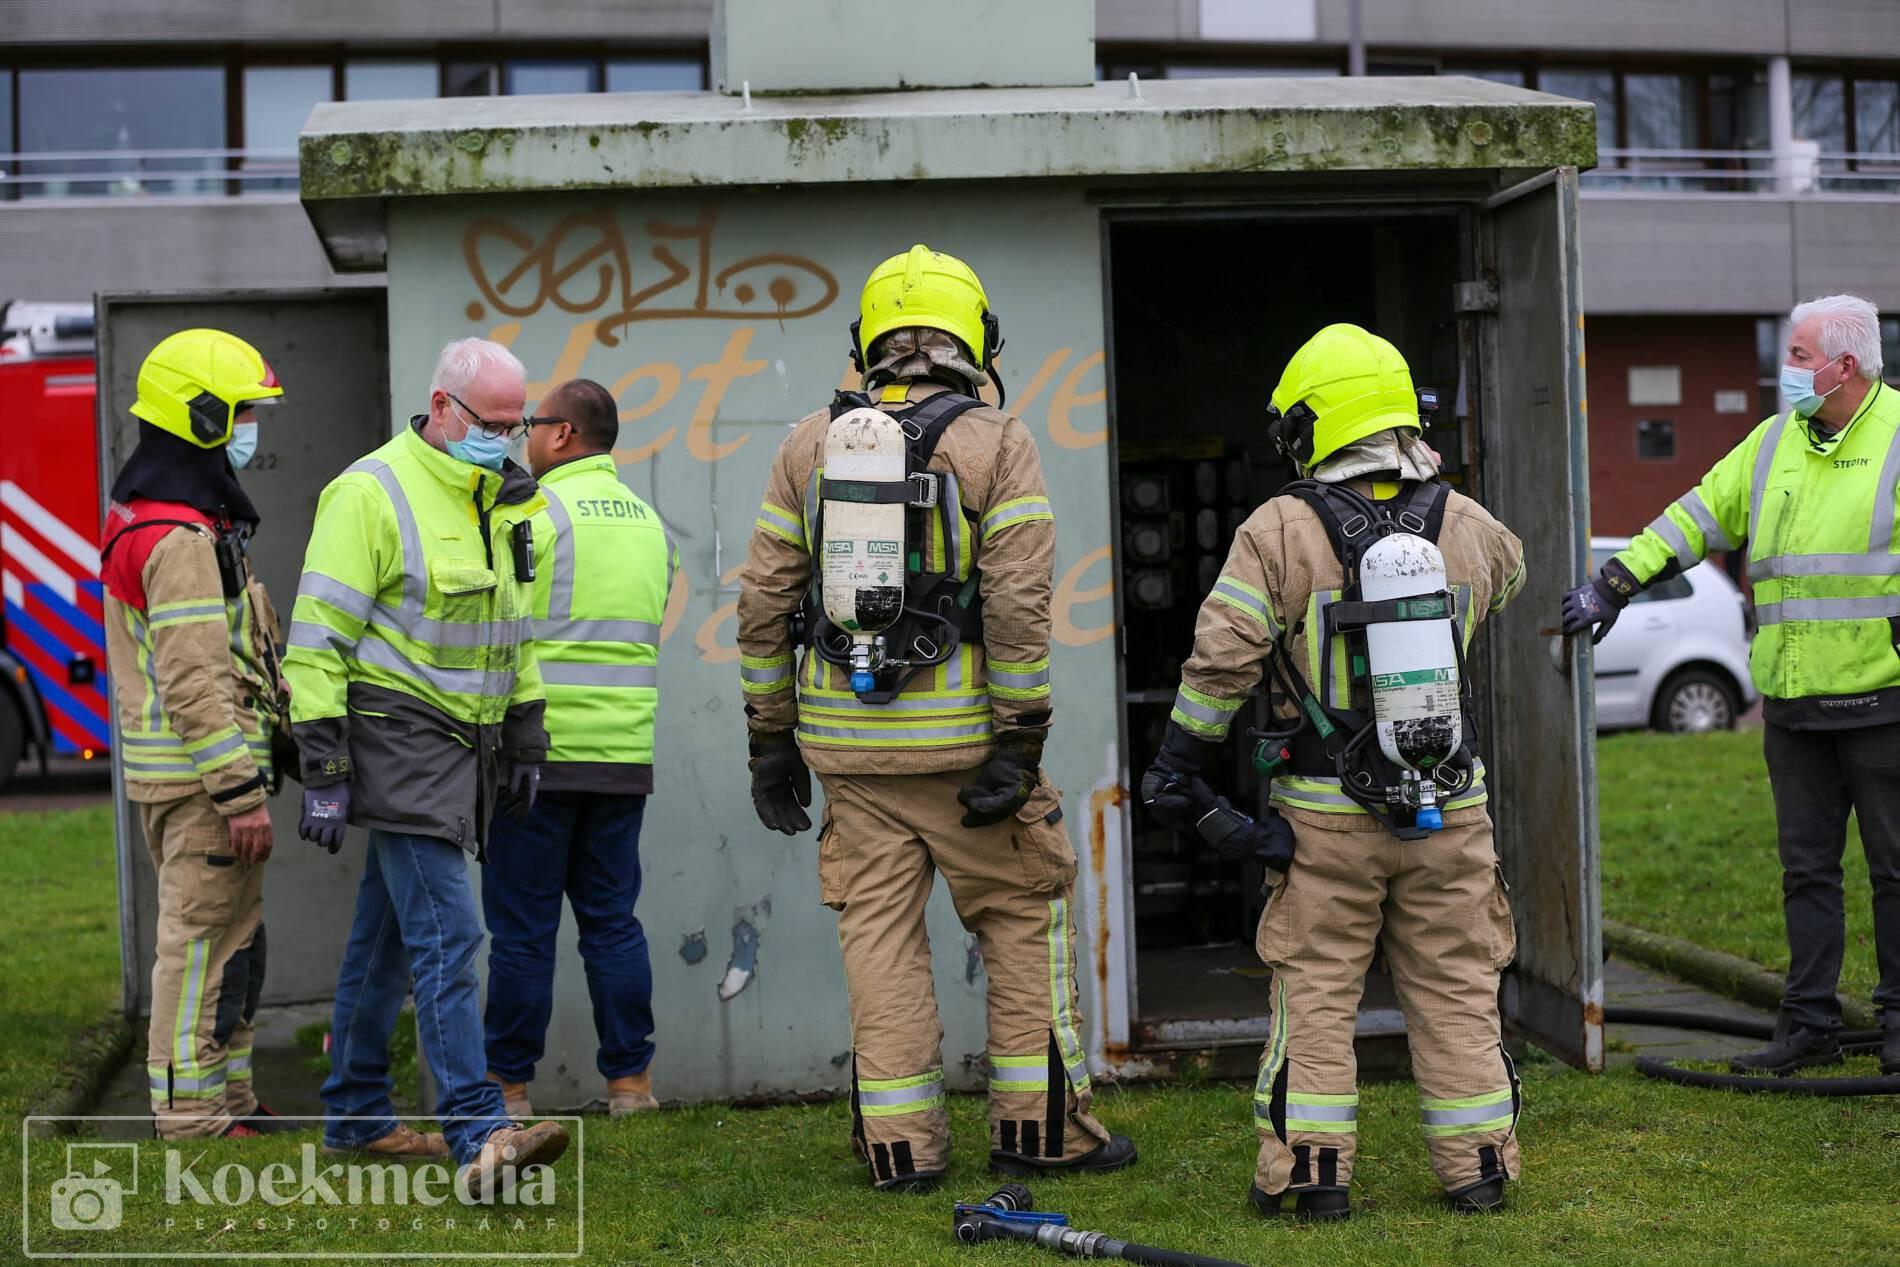 Brand in transformatorhuisje, 3500 woningen zonder stroom